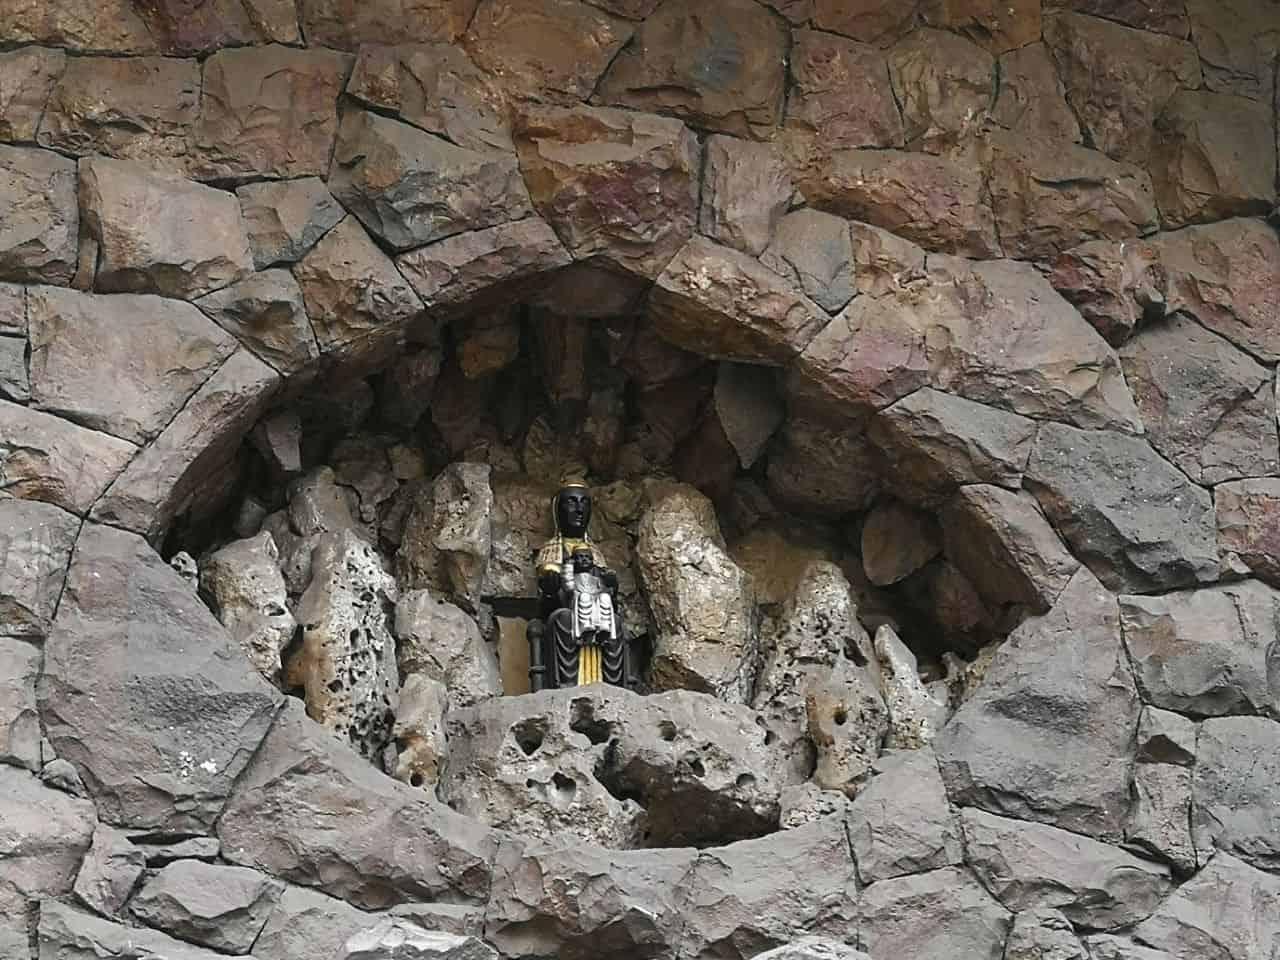 La finca de la virgen de Montserrat